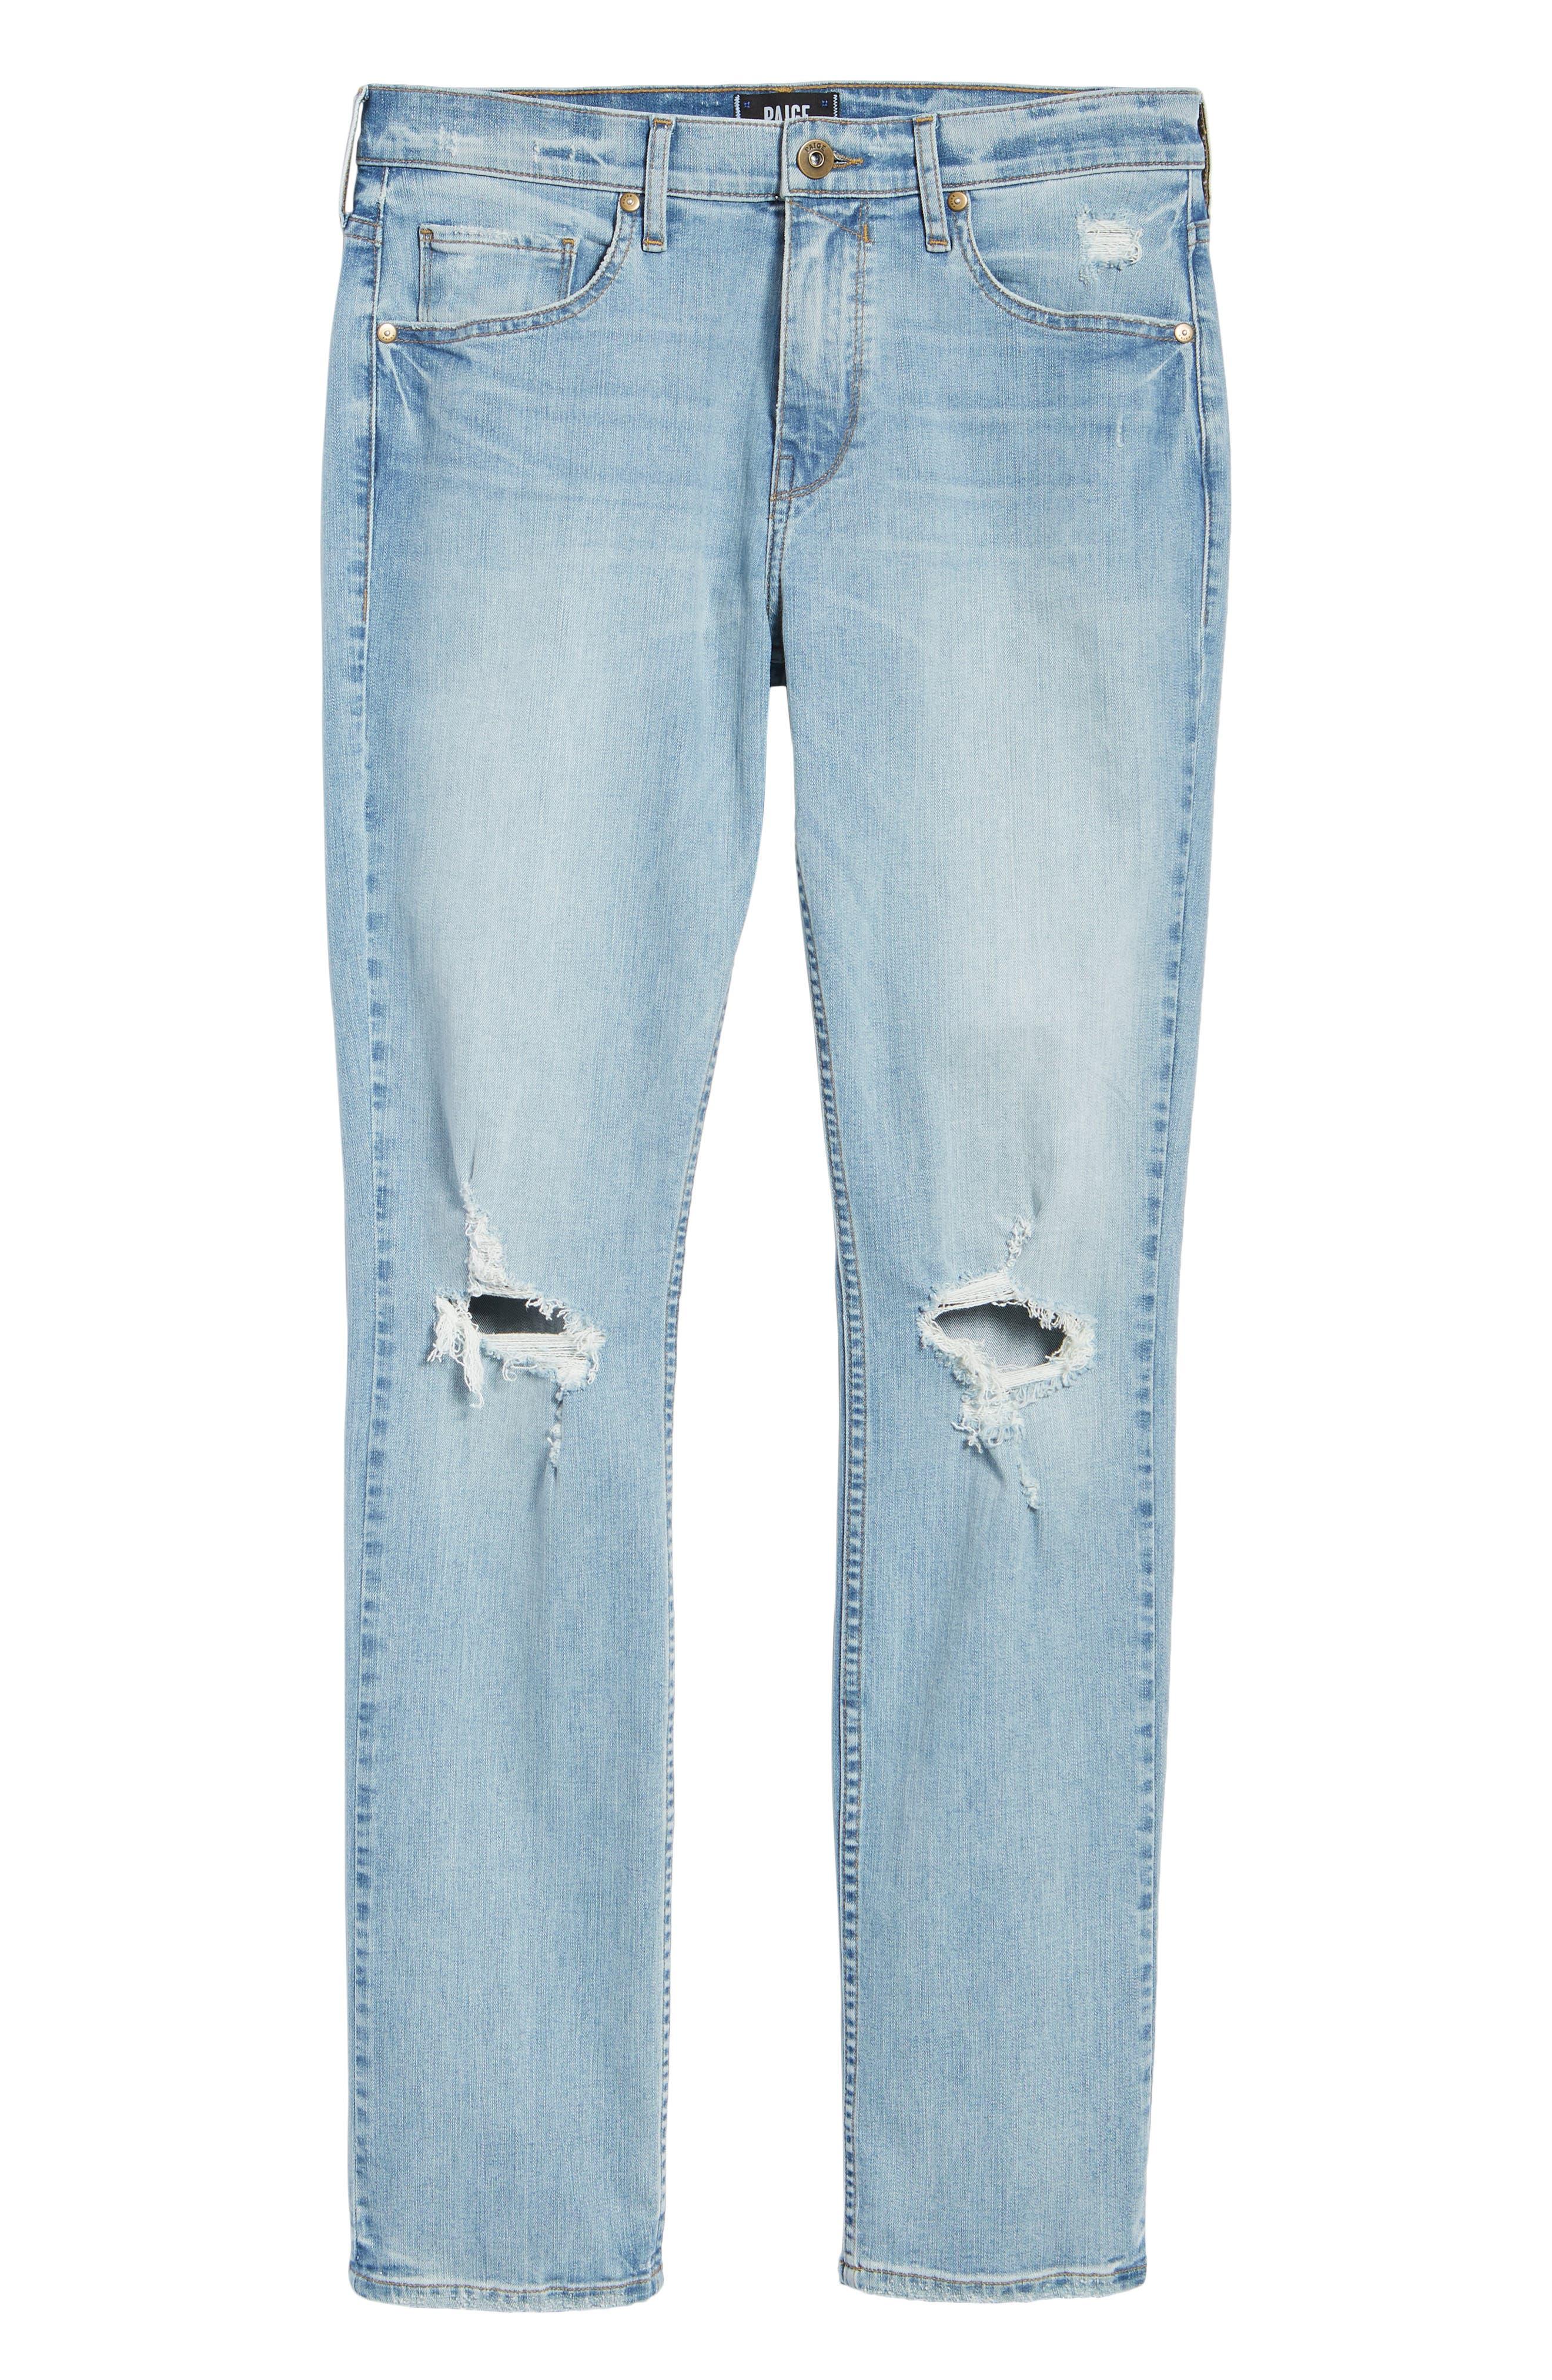 Lennox Slim Fit Jeans,                             Alternate thumbnail 6, color,                             County Destructed